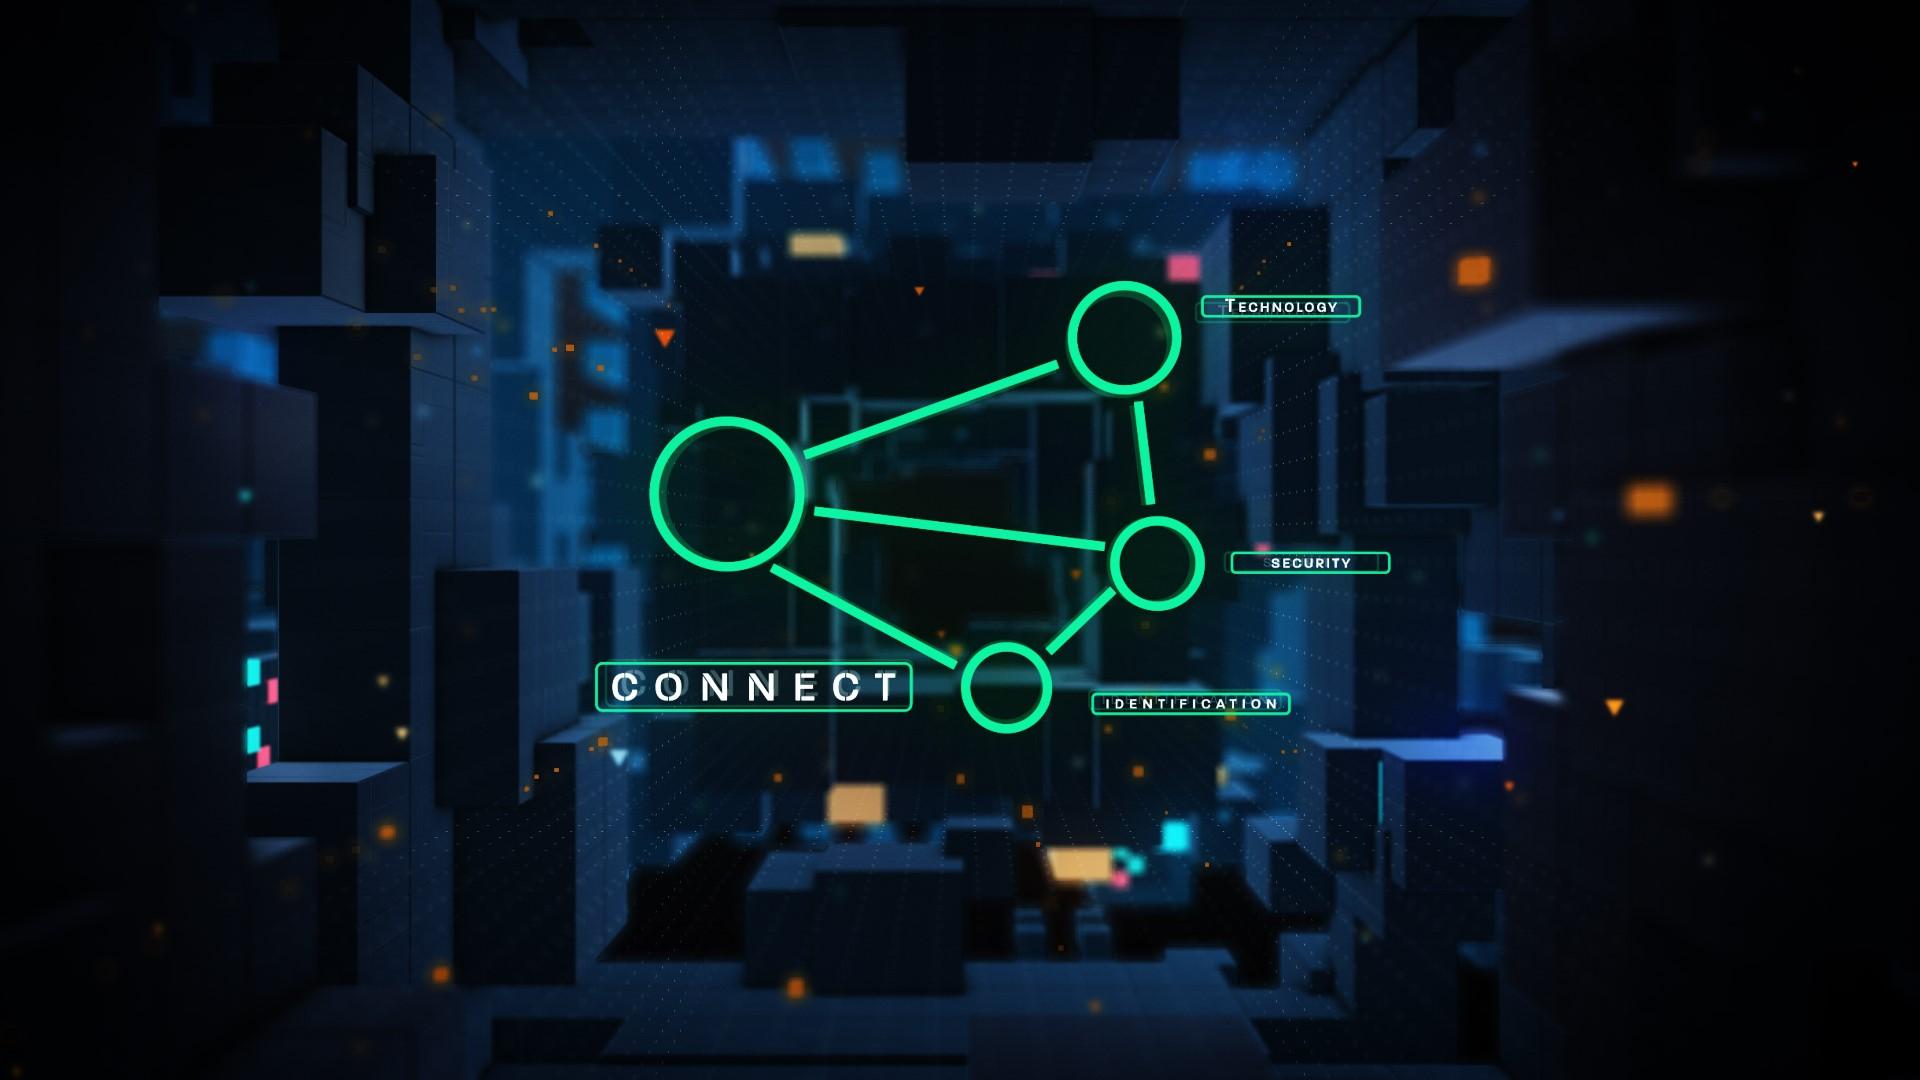 gamification-Gamification-2019-12-17-17-27-46